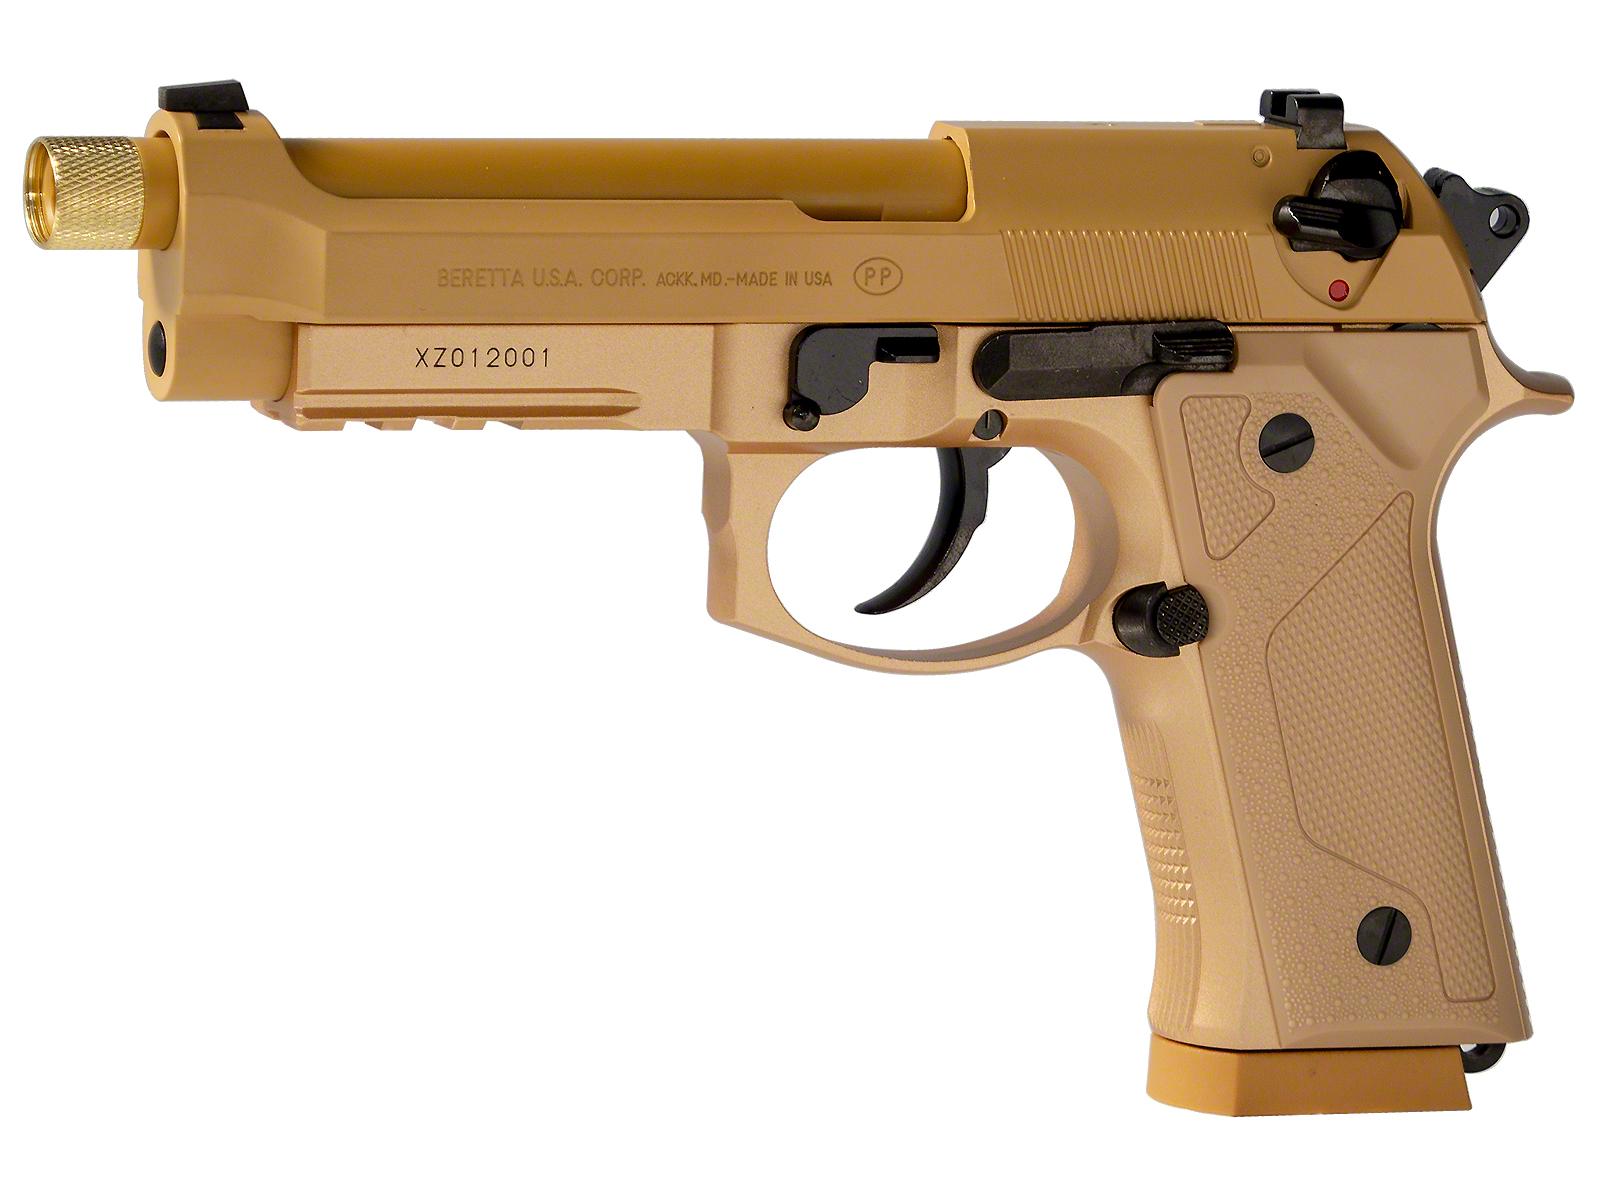 KSC M9A3 タイプF デザートサンド(タンカラー) ヘビーウェイトモデル ガスブローバック・ガスガン 対象年令18才以上(18歳以上)